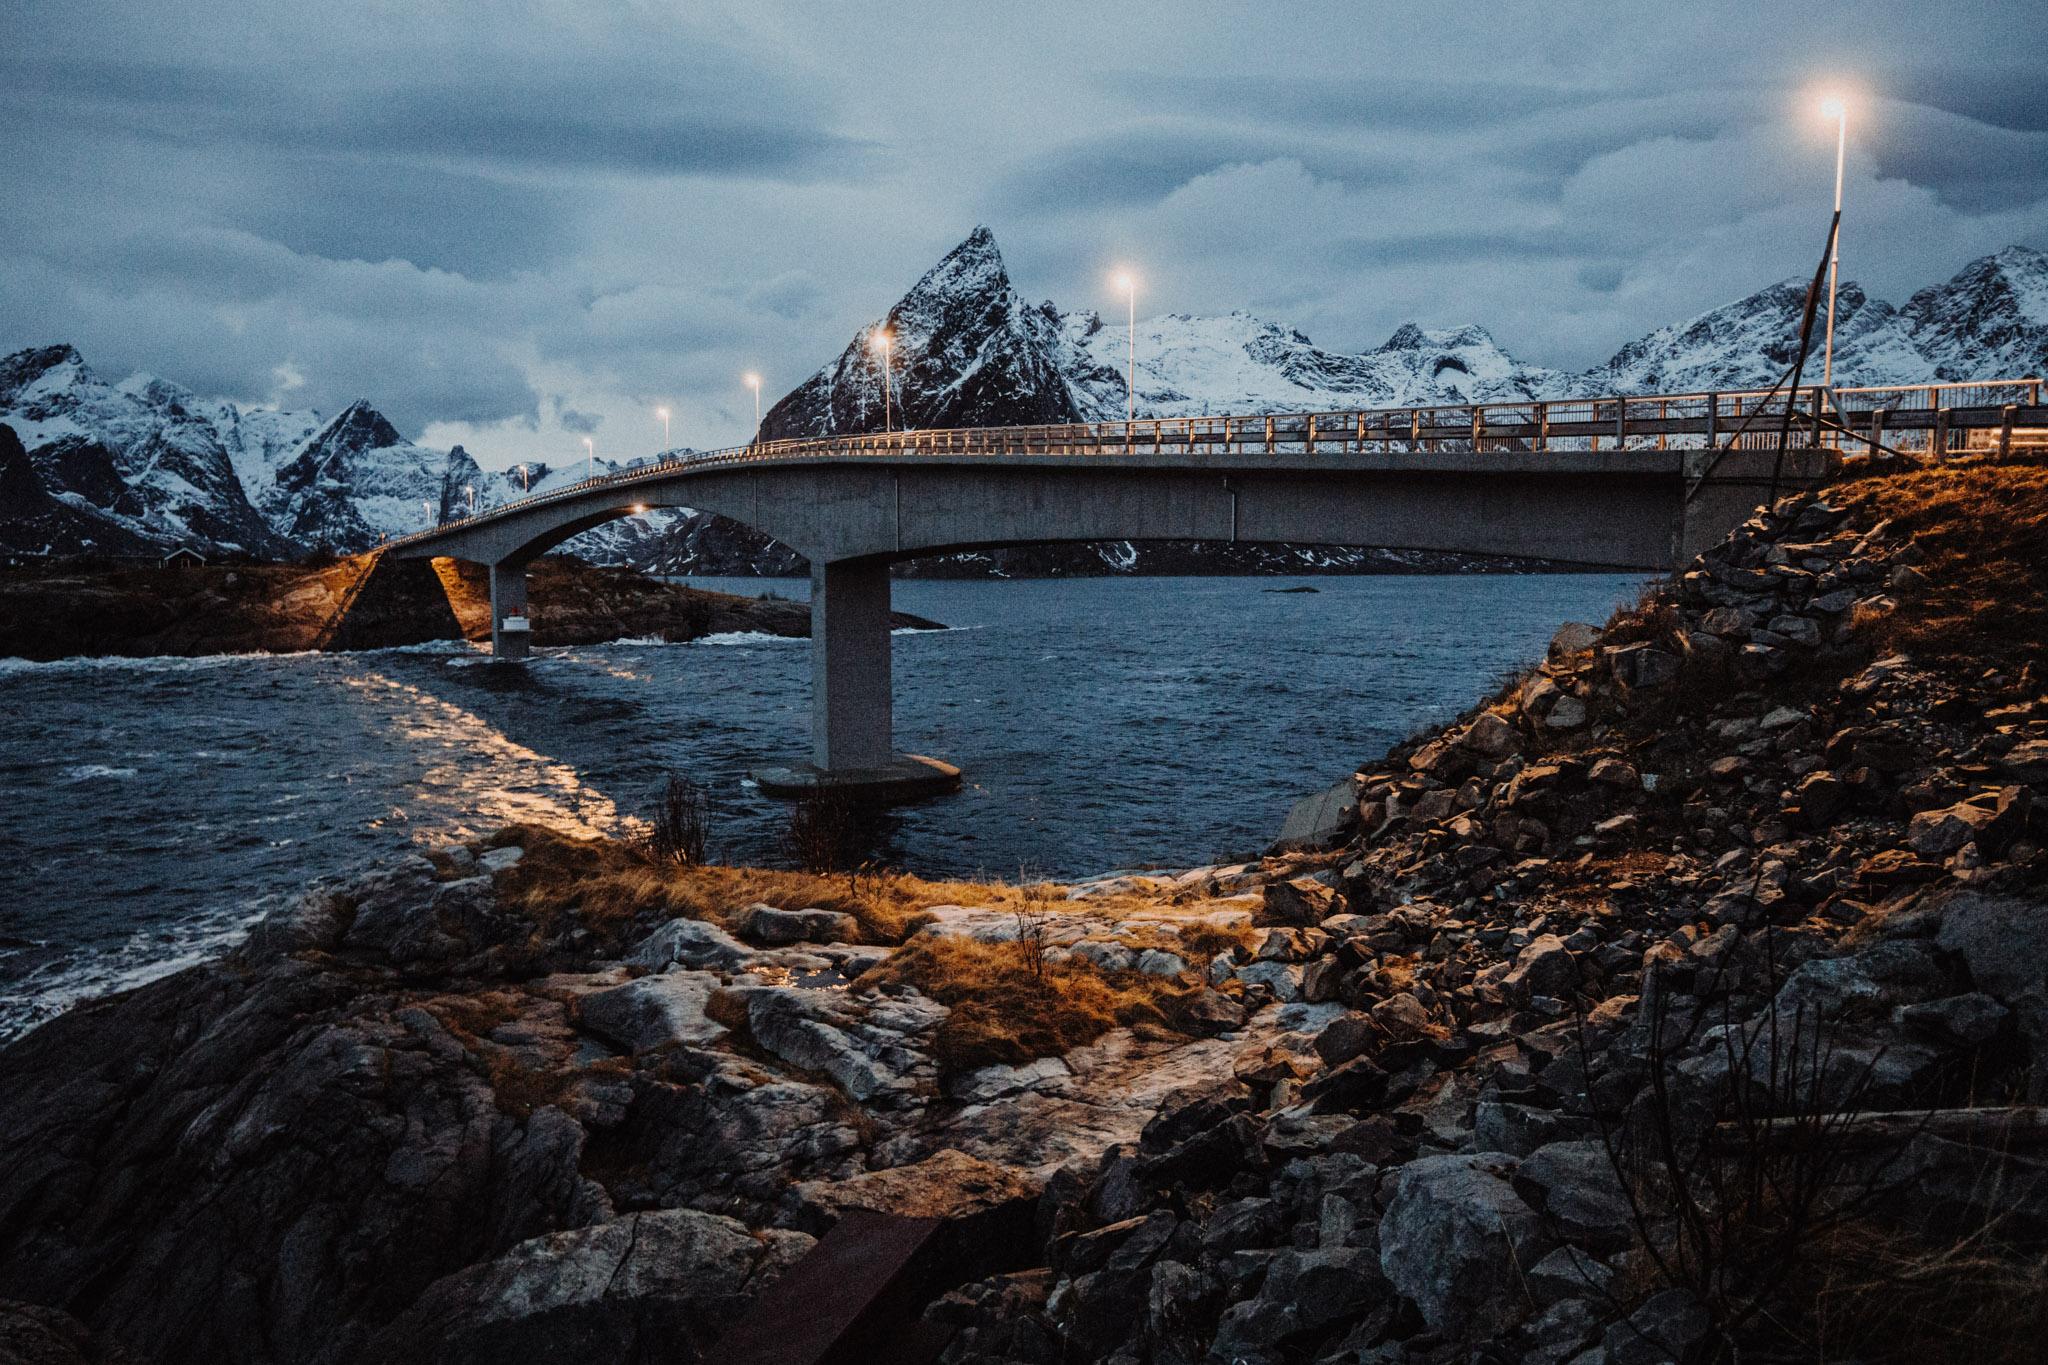 Norwegen Lofoten Reisetiere Fotografiereise Reise Fotografie Workshop